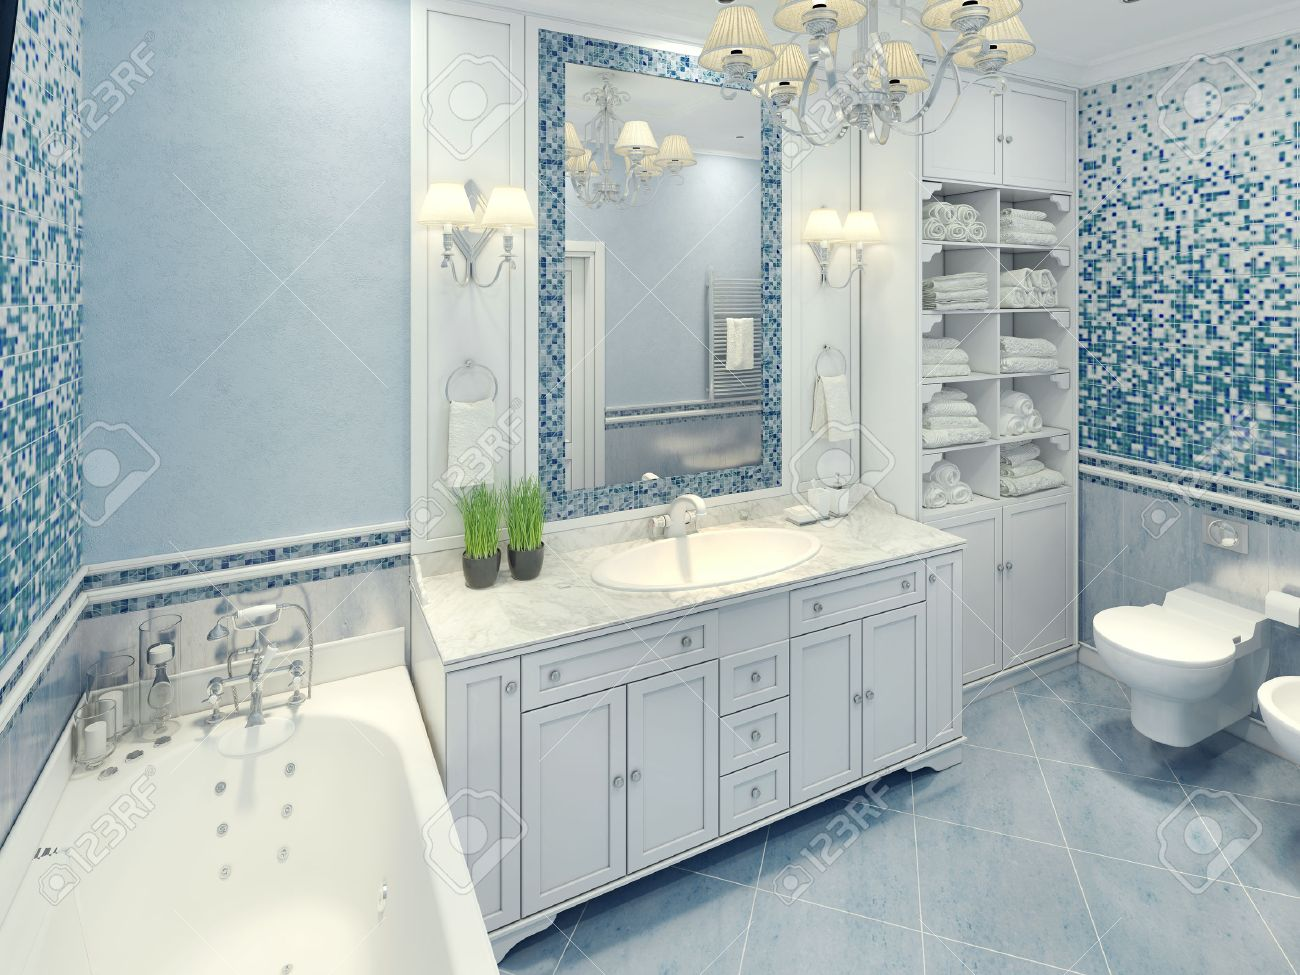 Badkamer Pimpen Badkamerverlichting : Badkamerverlichting art deco art deco badkamer photograph